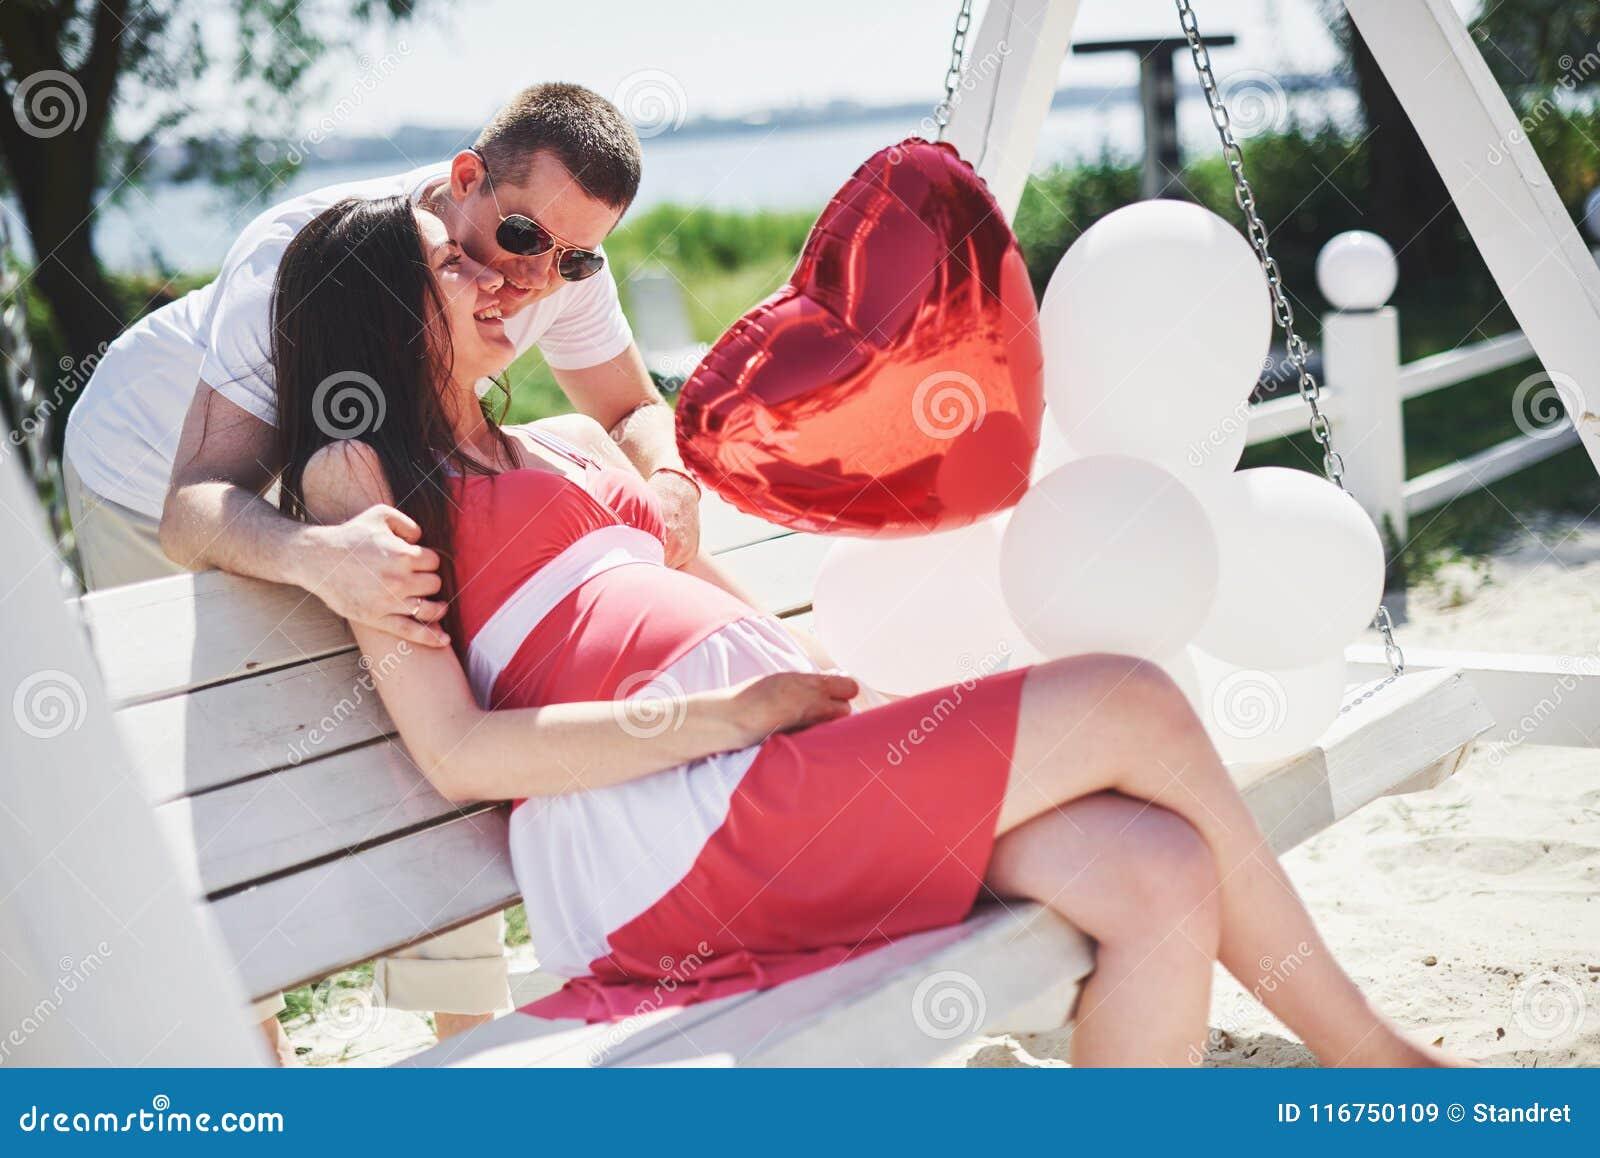 Frum dating advies